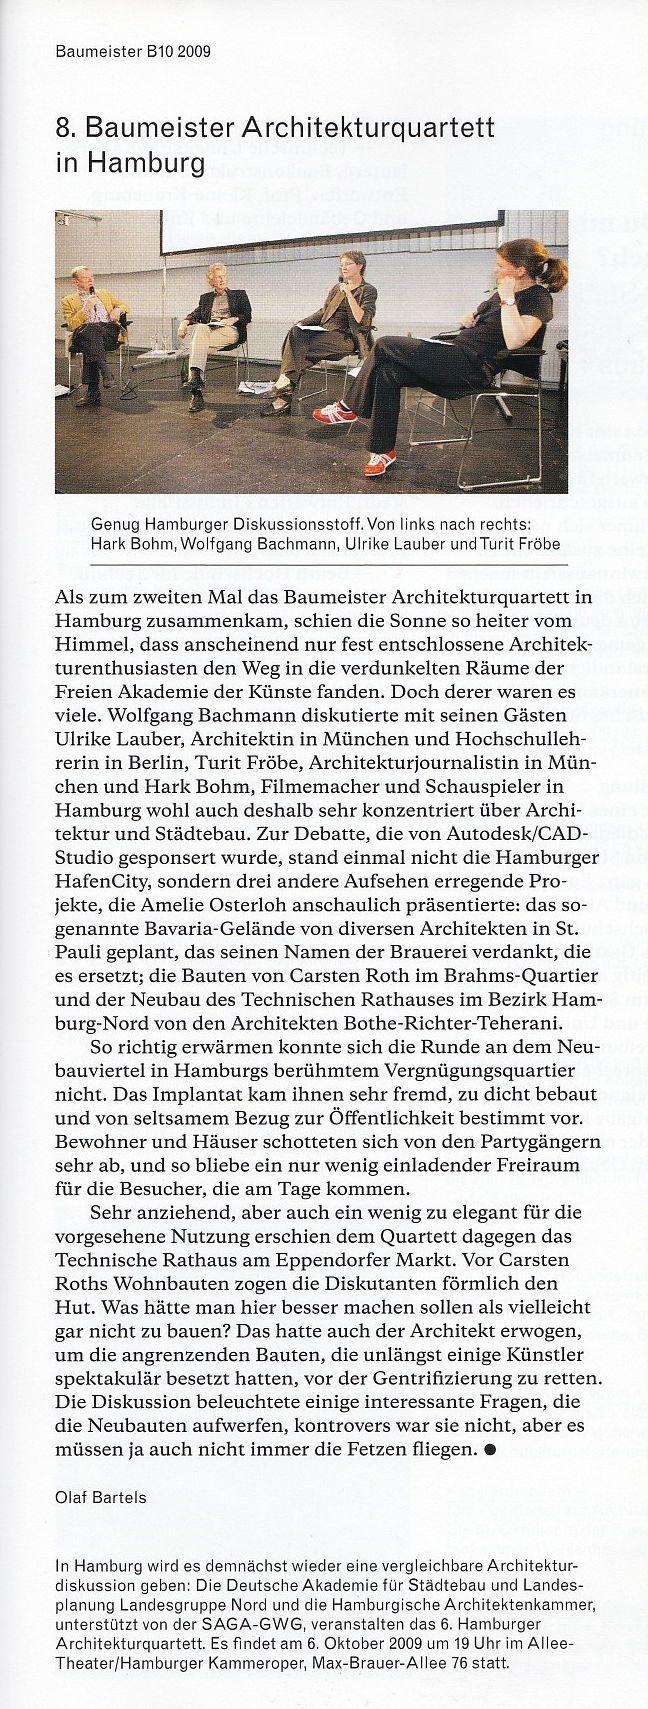 Baumeister Architekturquartett. Hamburg